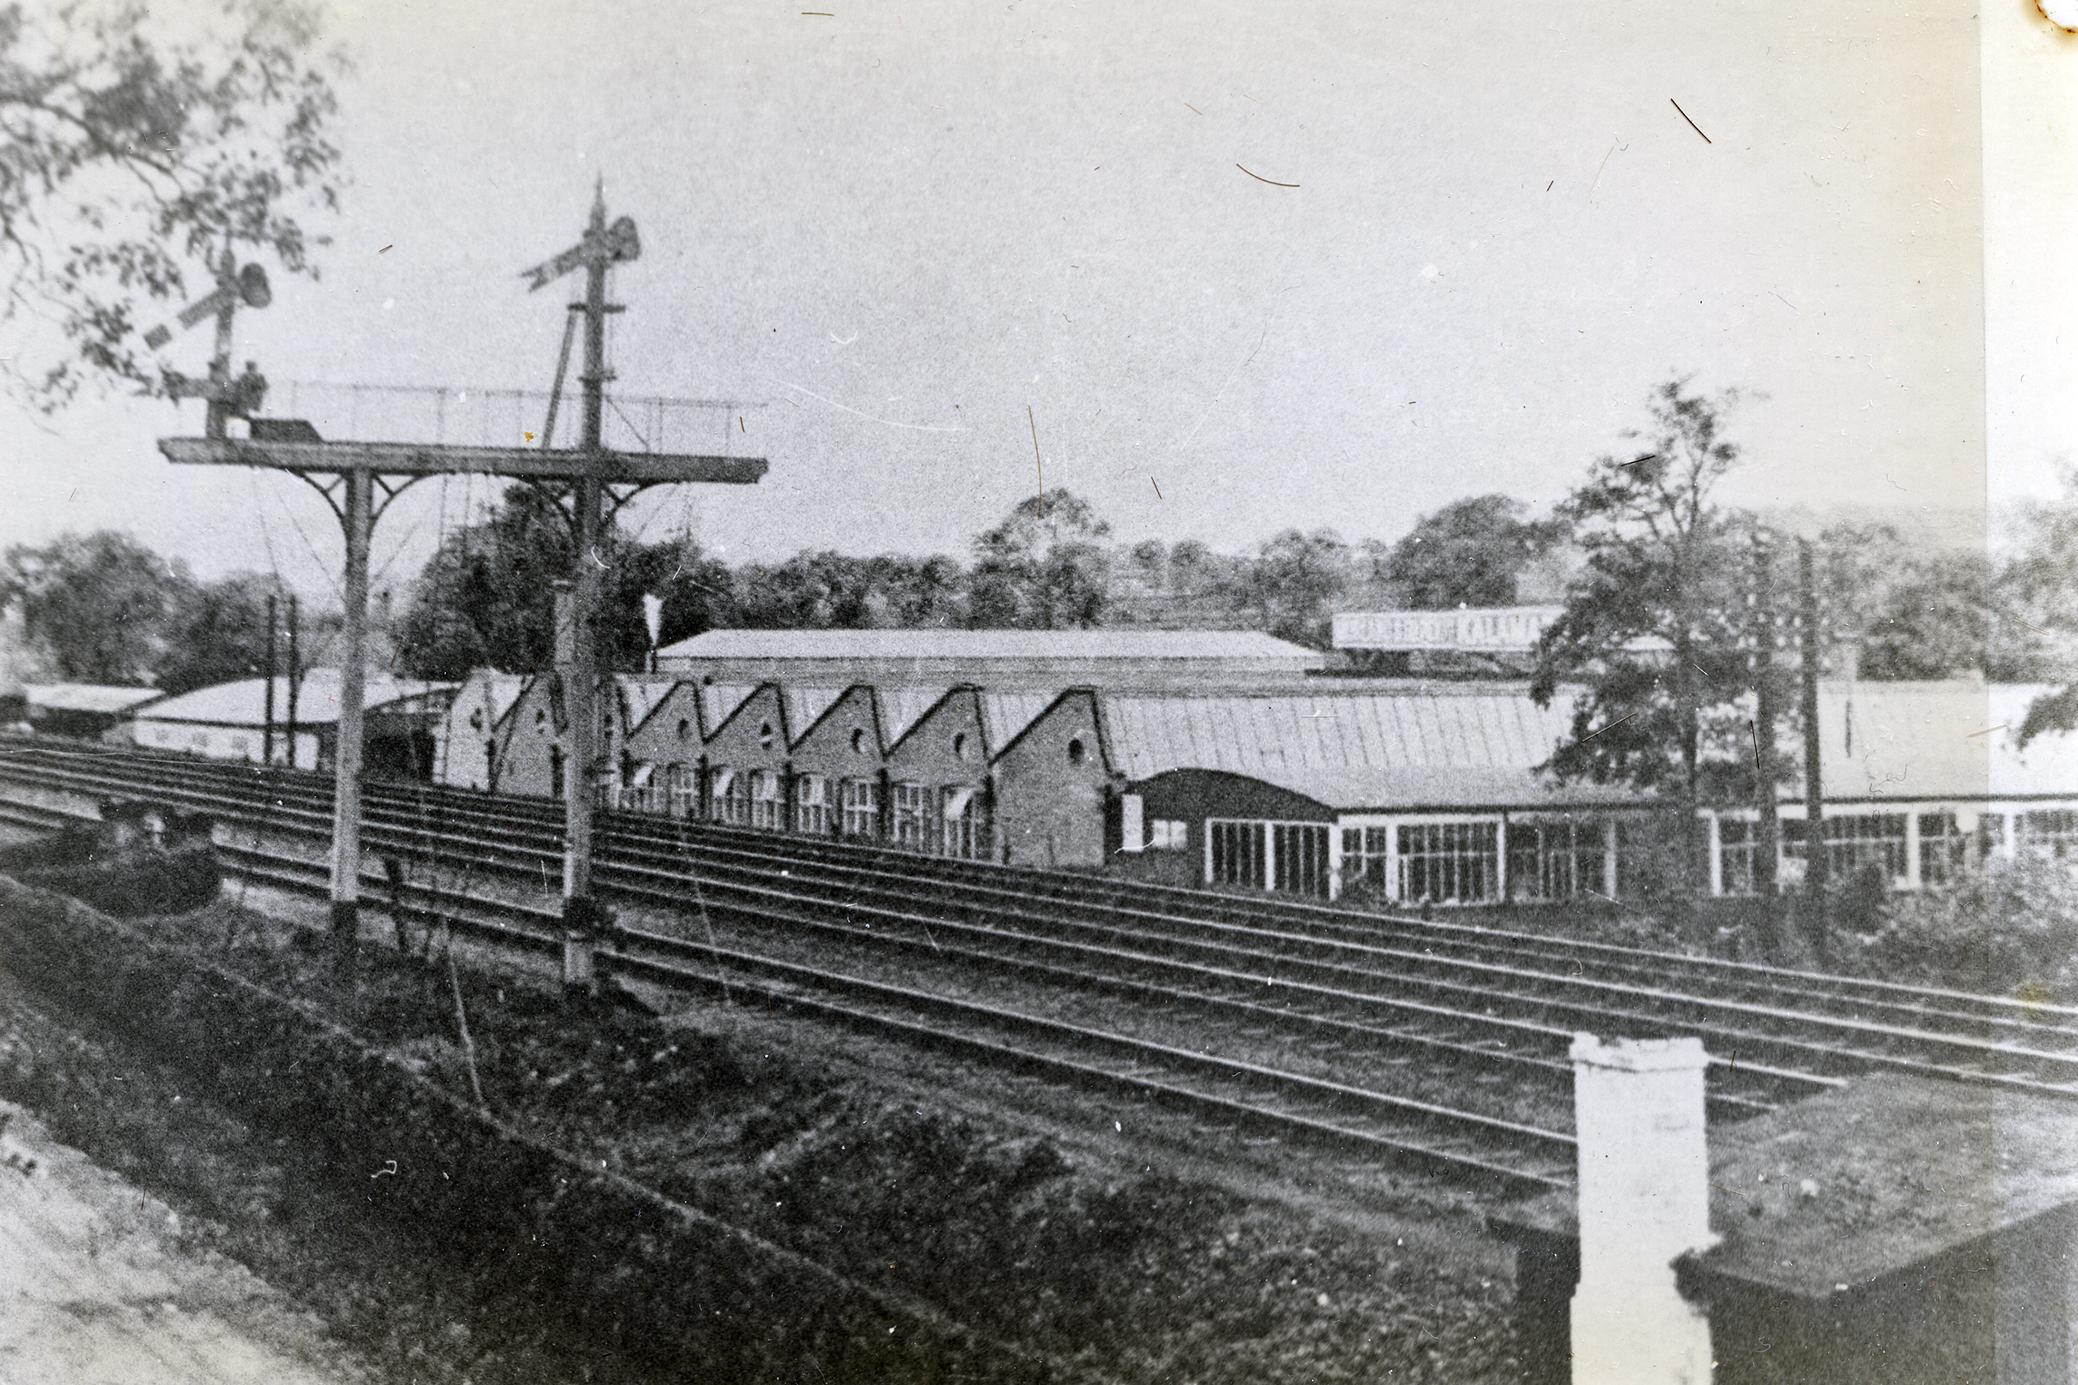 Kalamazoo, 1920's